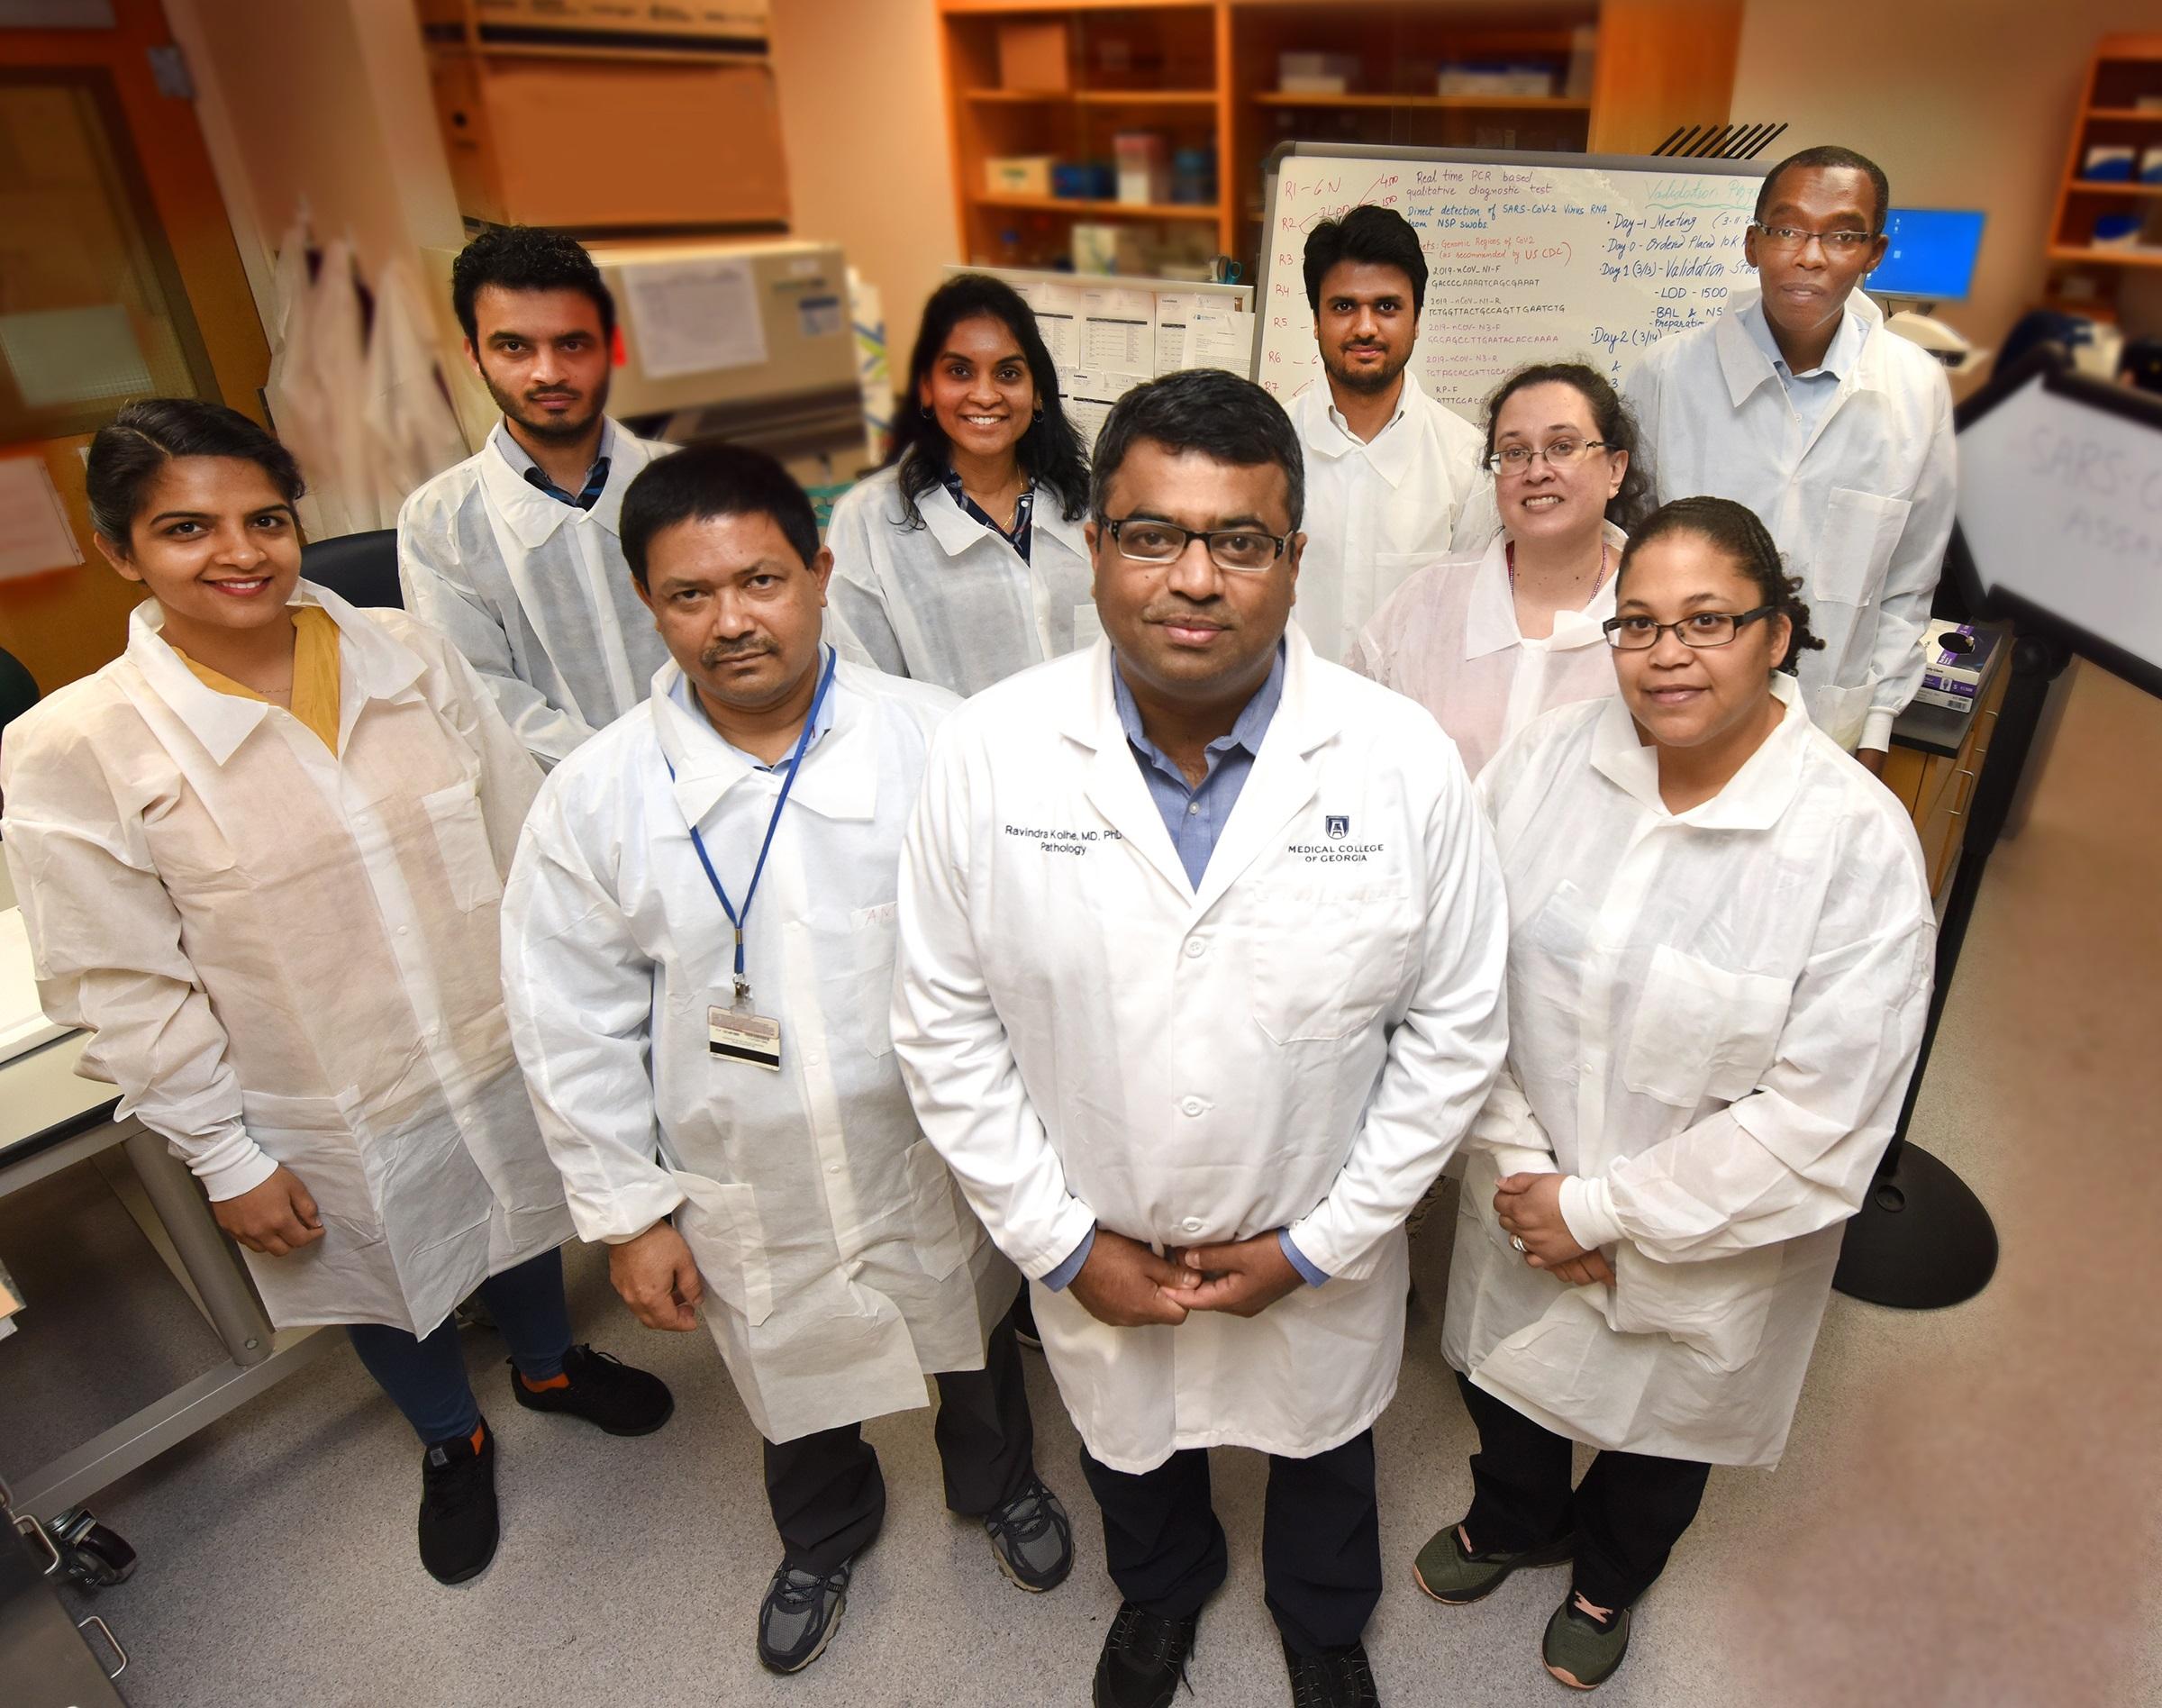 MCG's GEM Lab offering coronavirus testing statewide